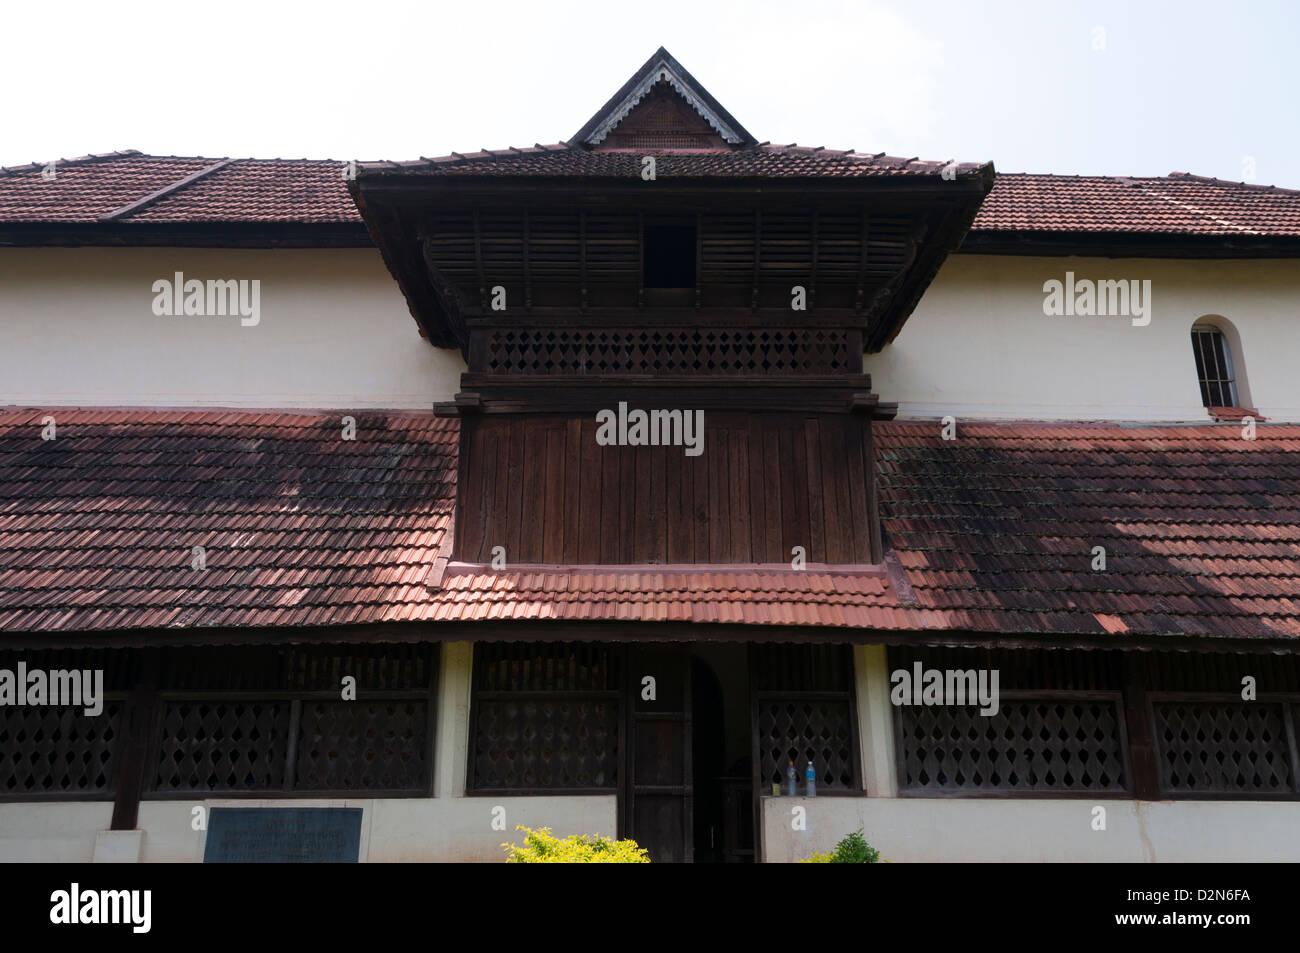 Traditional Kerala Roof Stock Photos Amp Traditional Kerala